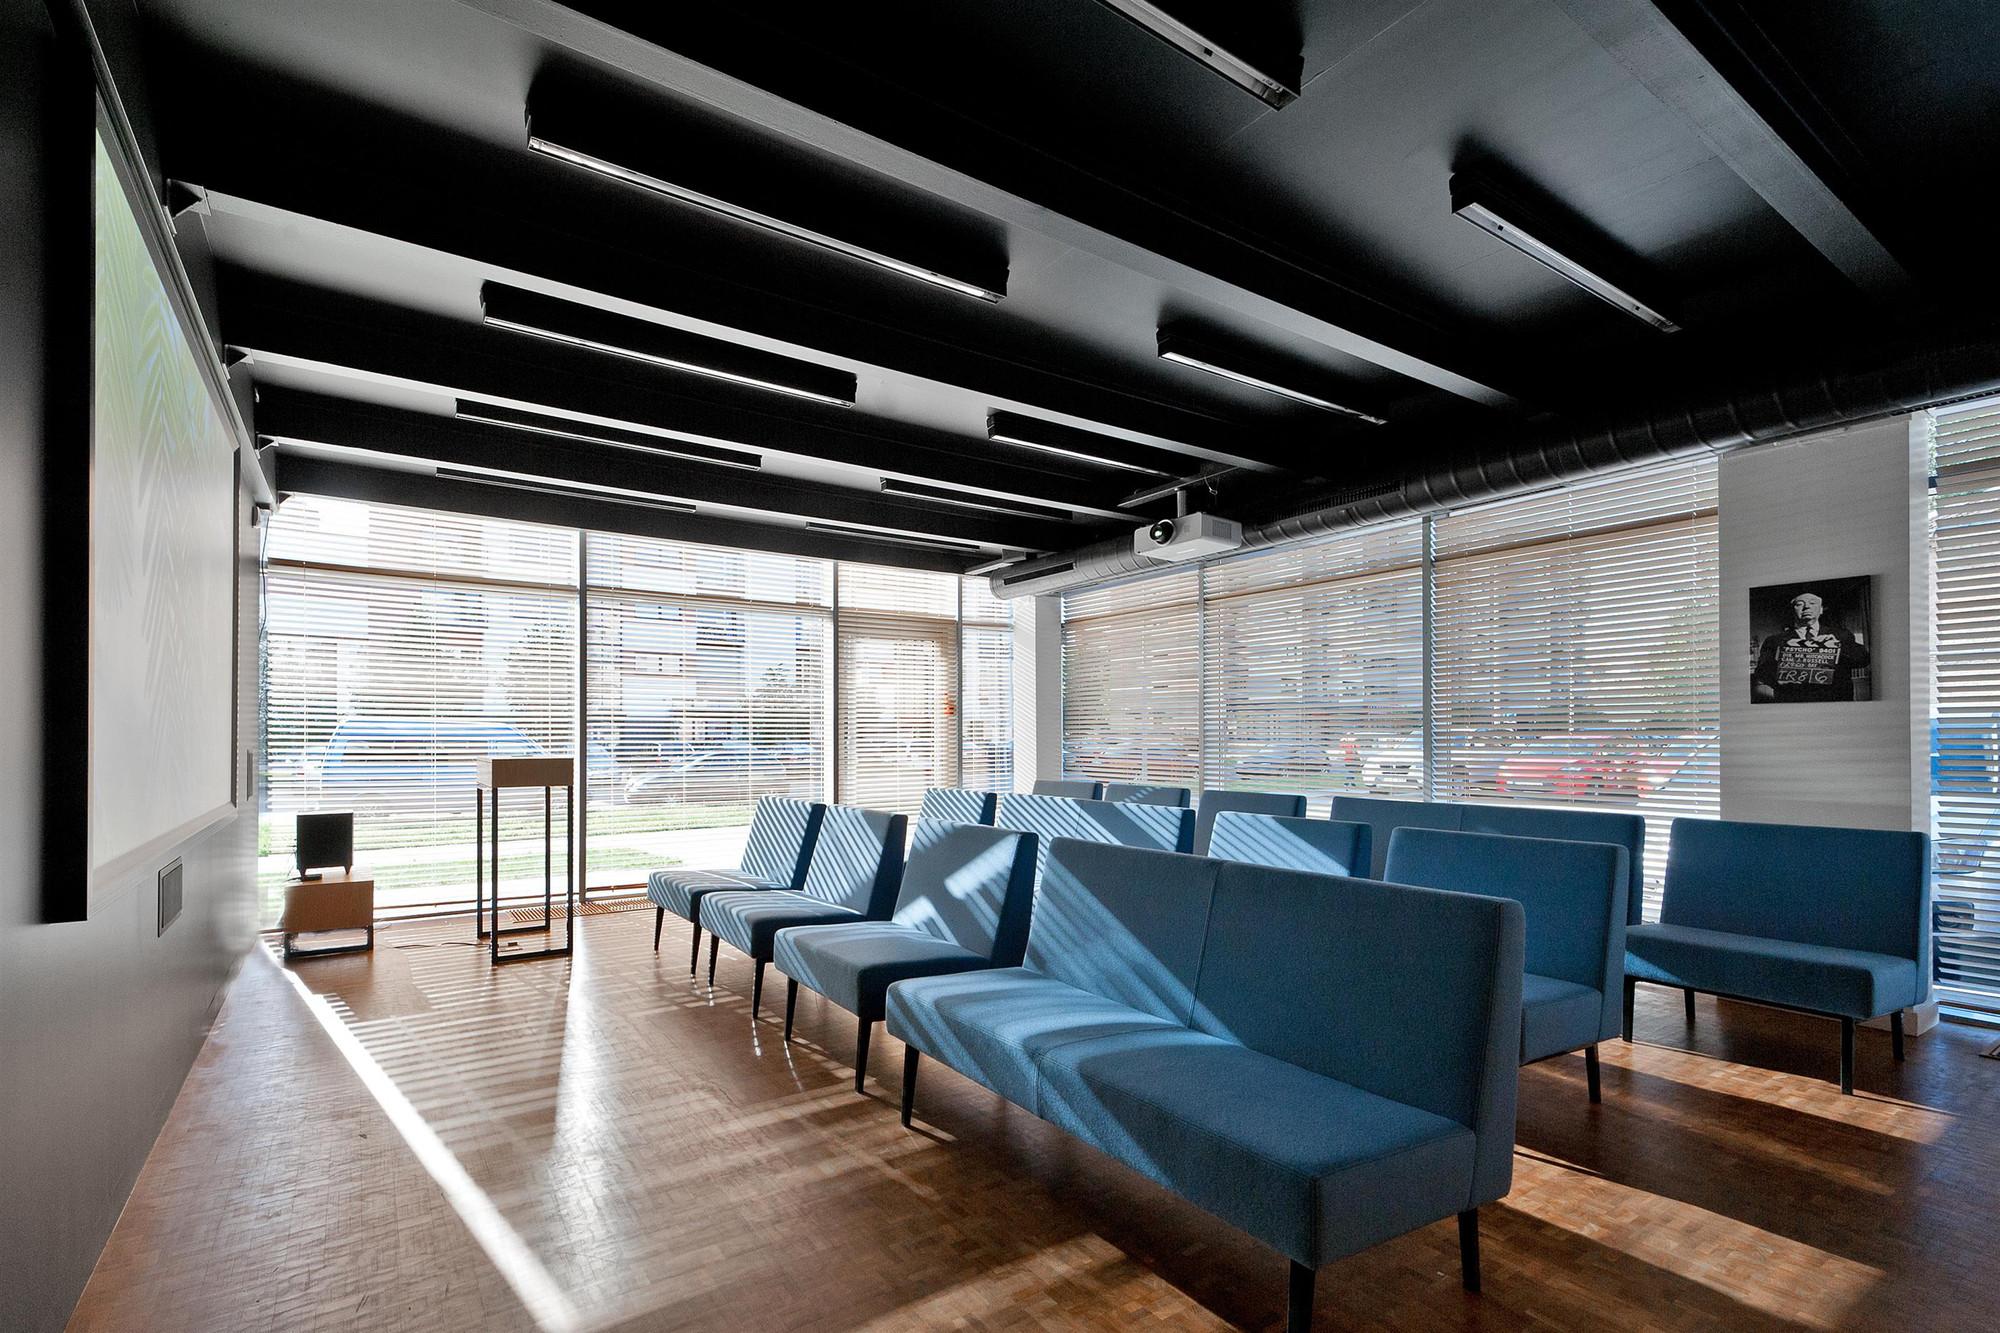 Architecture Studio gallery of pixelmator team office / plazma architecture studio - 5